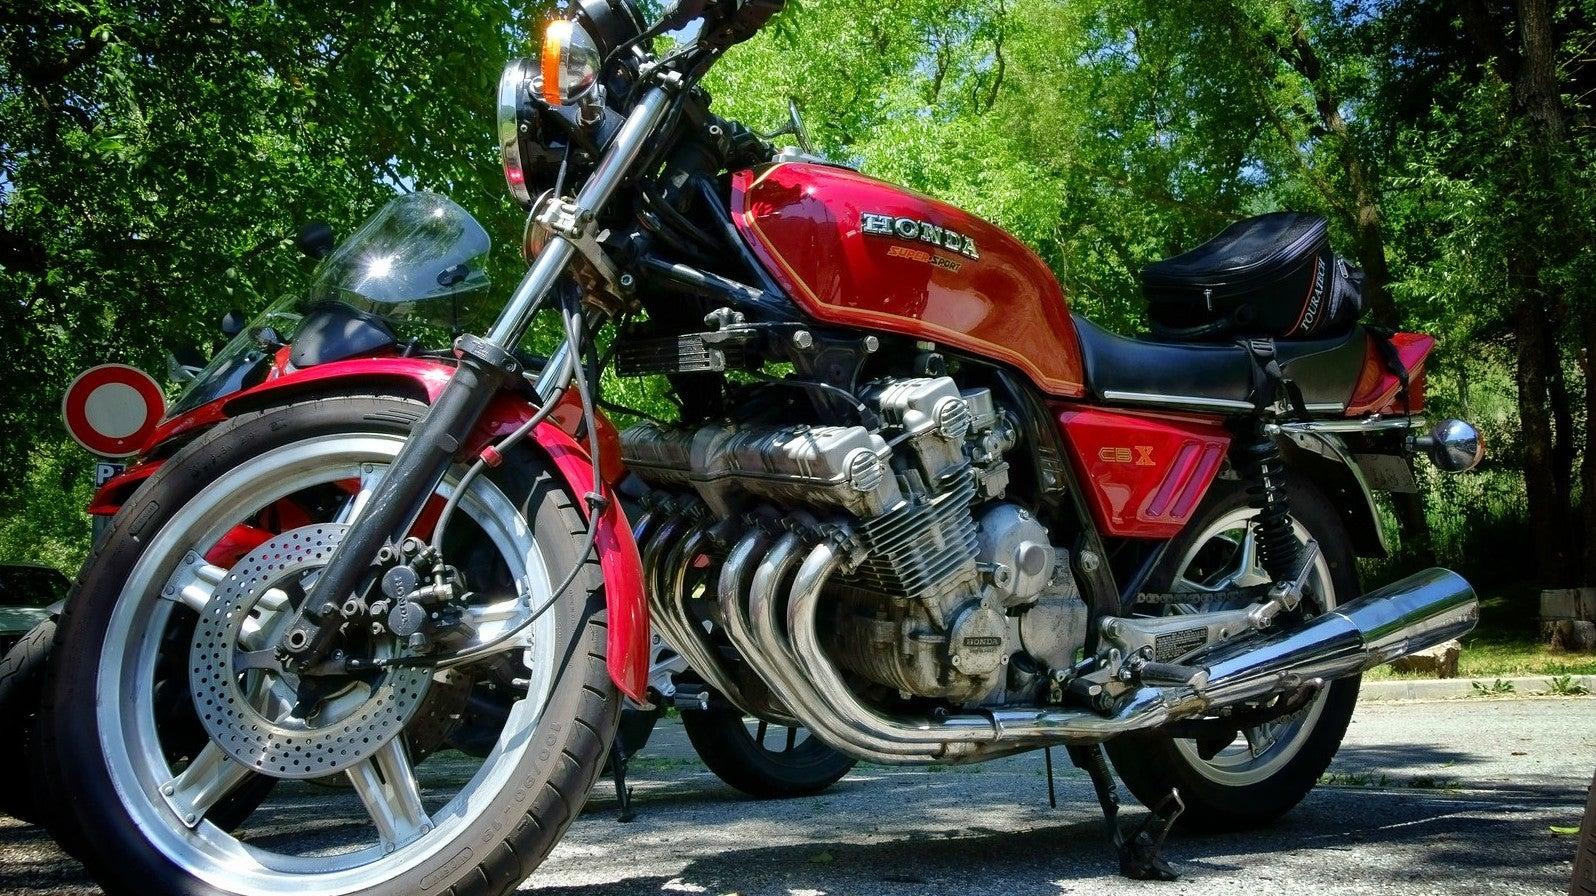 The Honda CBX Makes The Best Noise